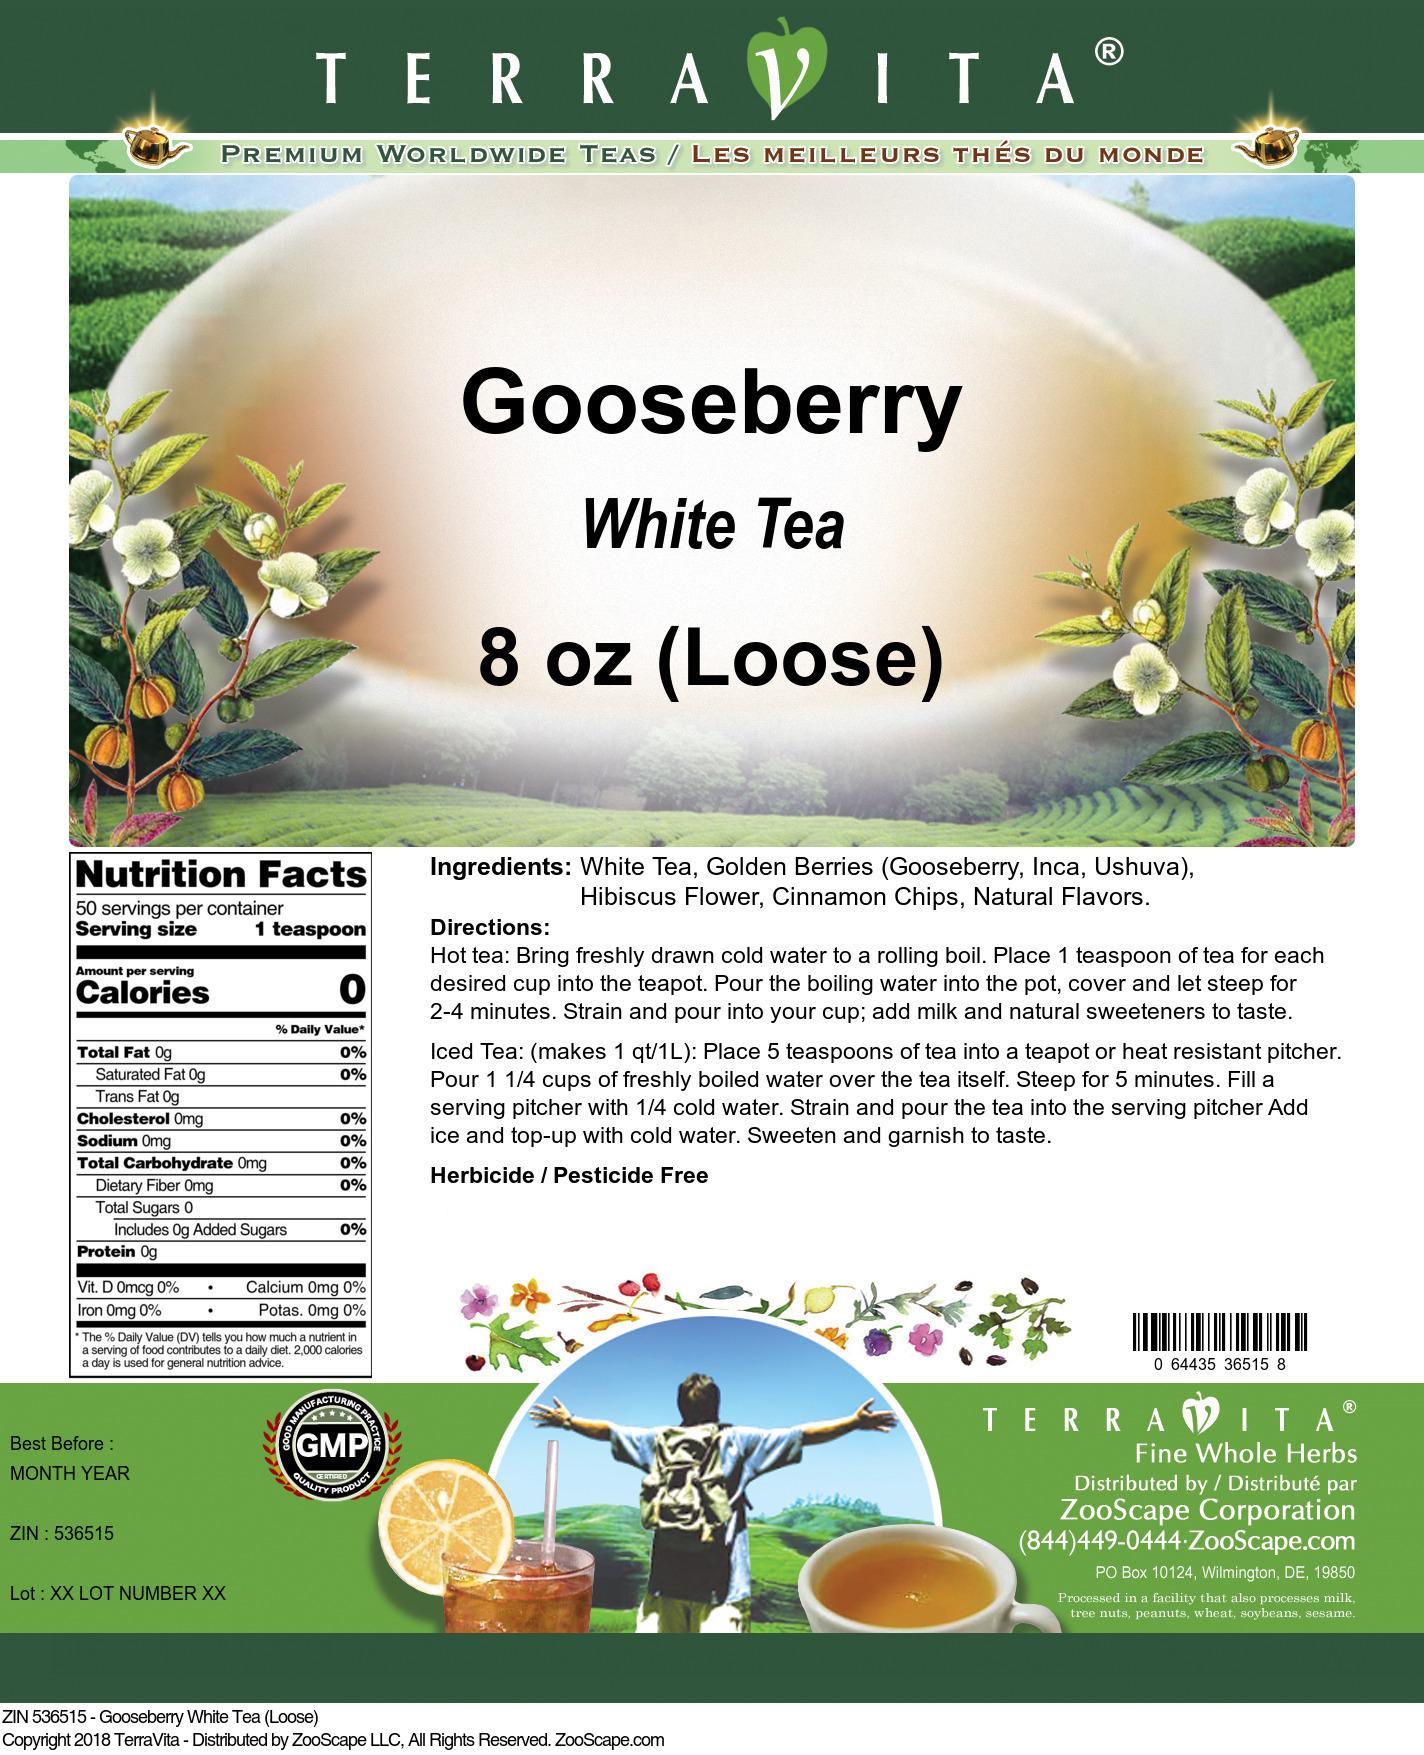 Gooseberry White Tea (Loose)